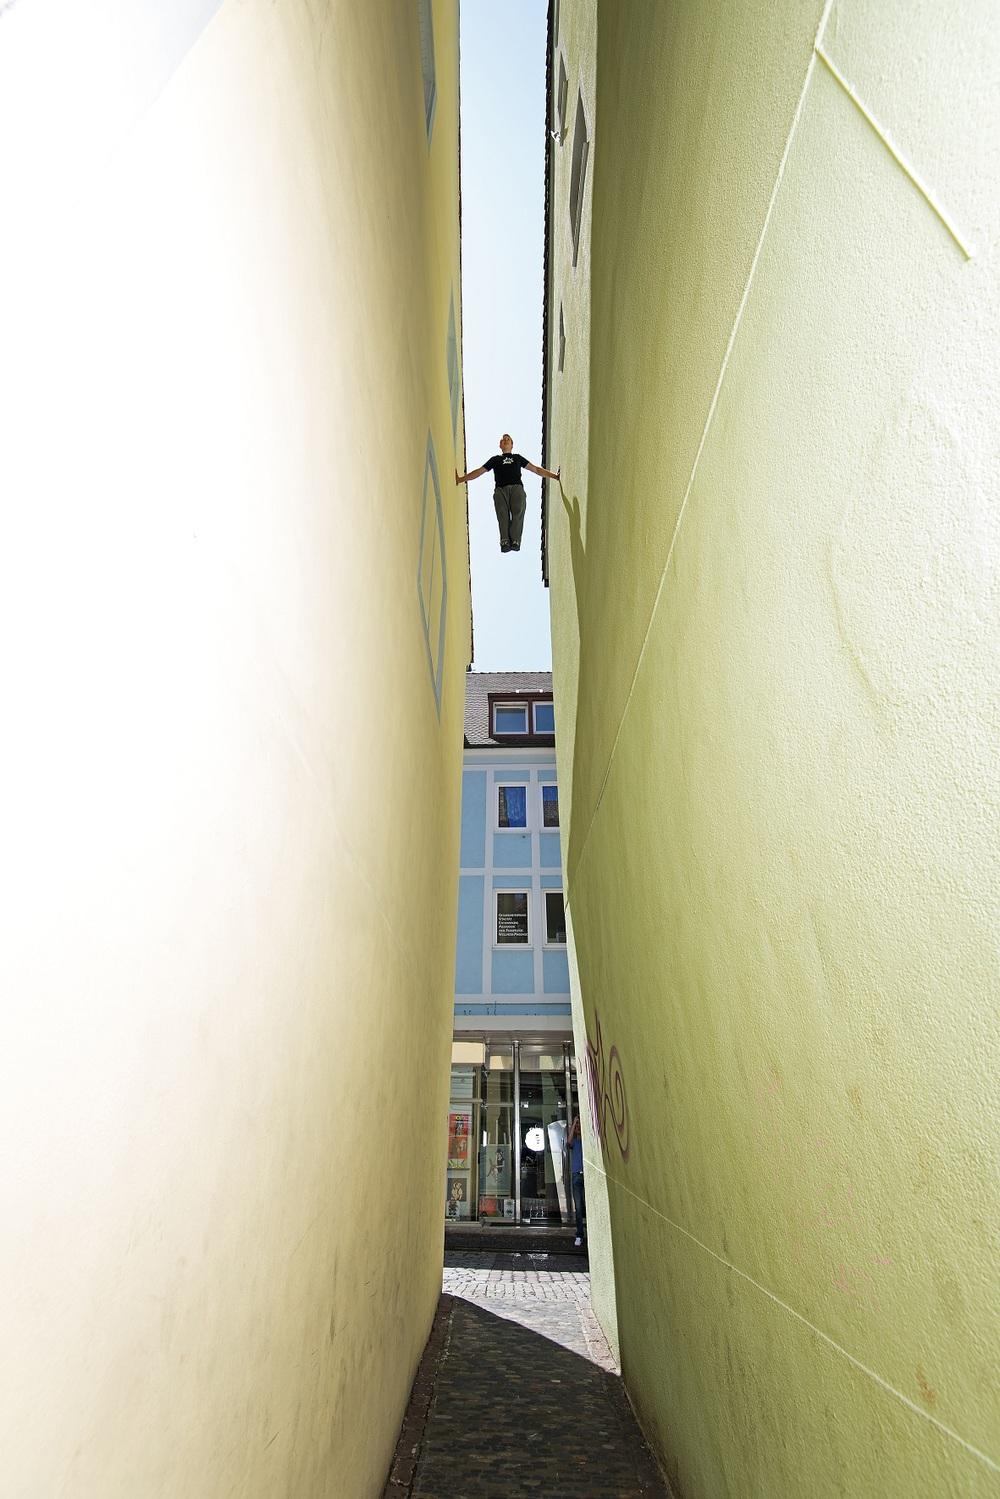 Gassenklettern Fotograf Stefan Pranjic.jpg